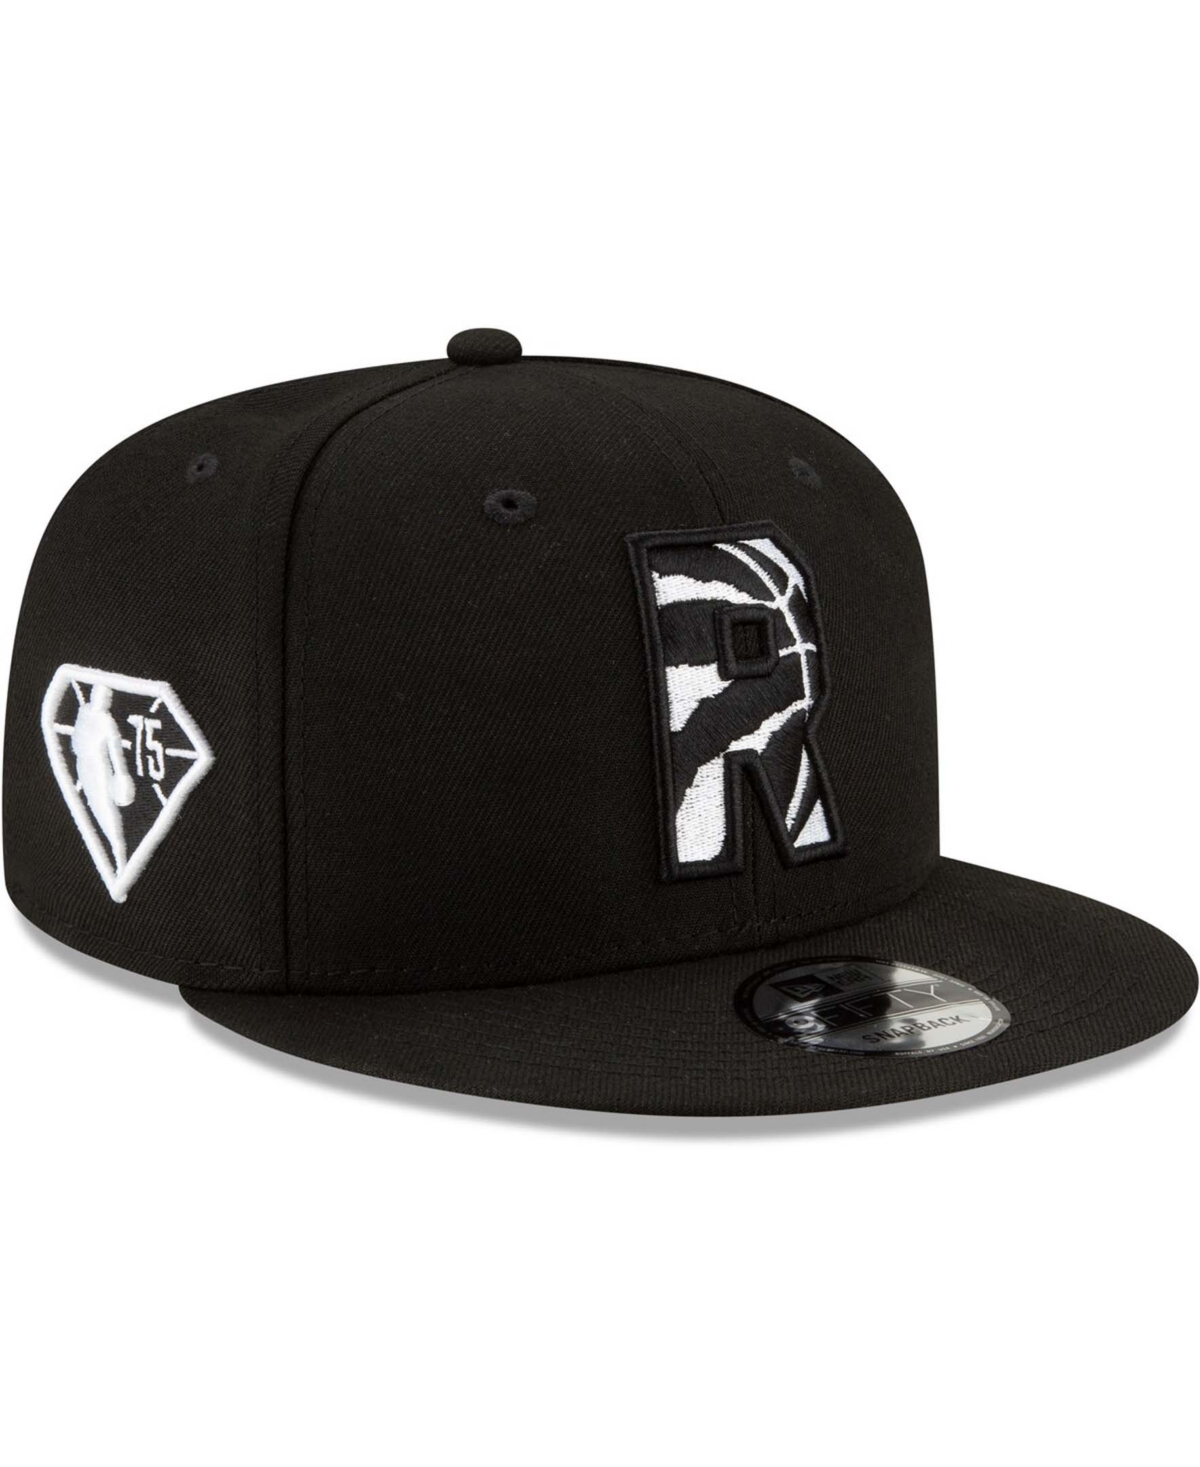 Men's Black Toronto Raptors 2021 Nba Draft Alternate 9Fifty Snapback Hat